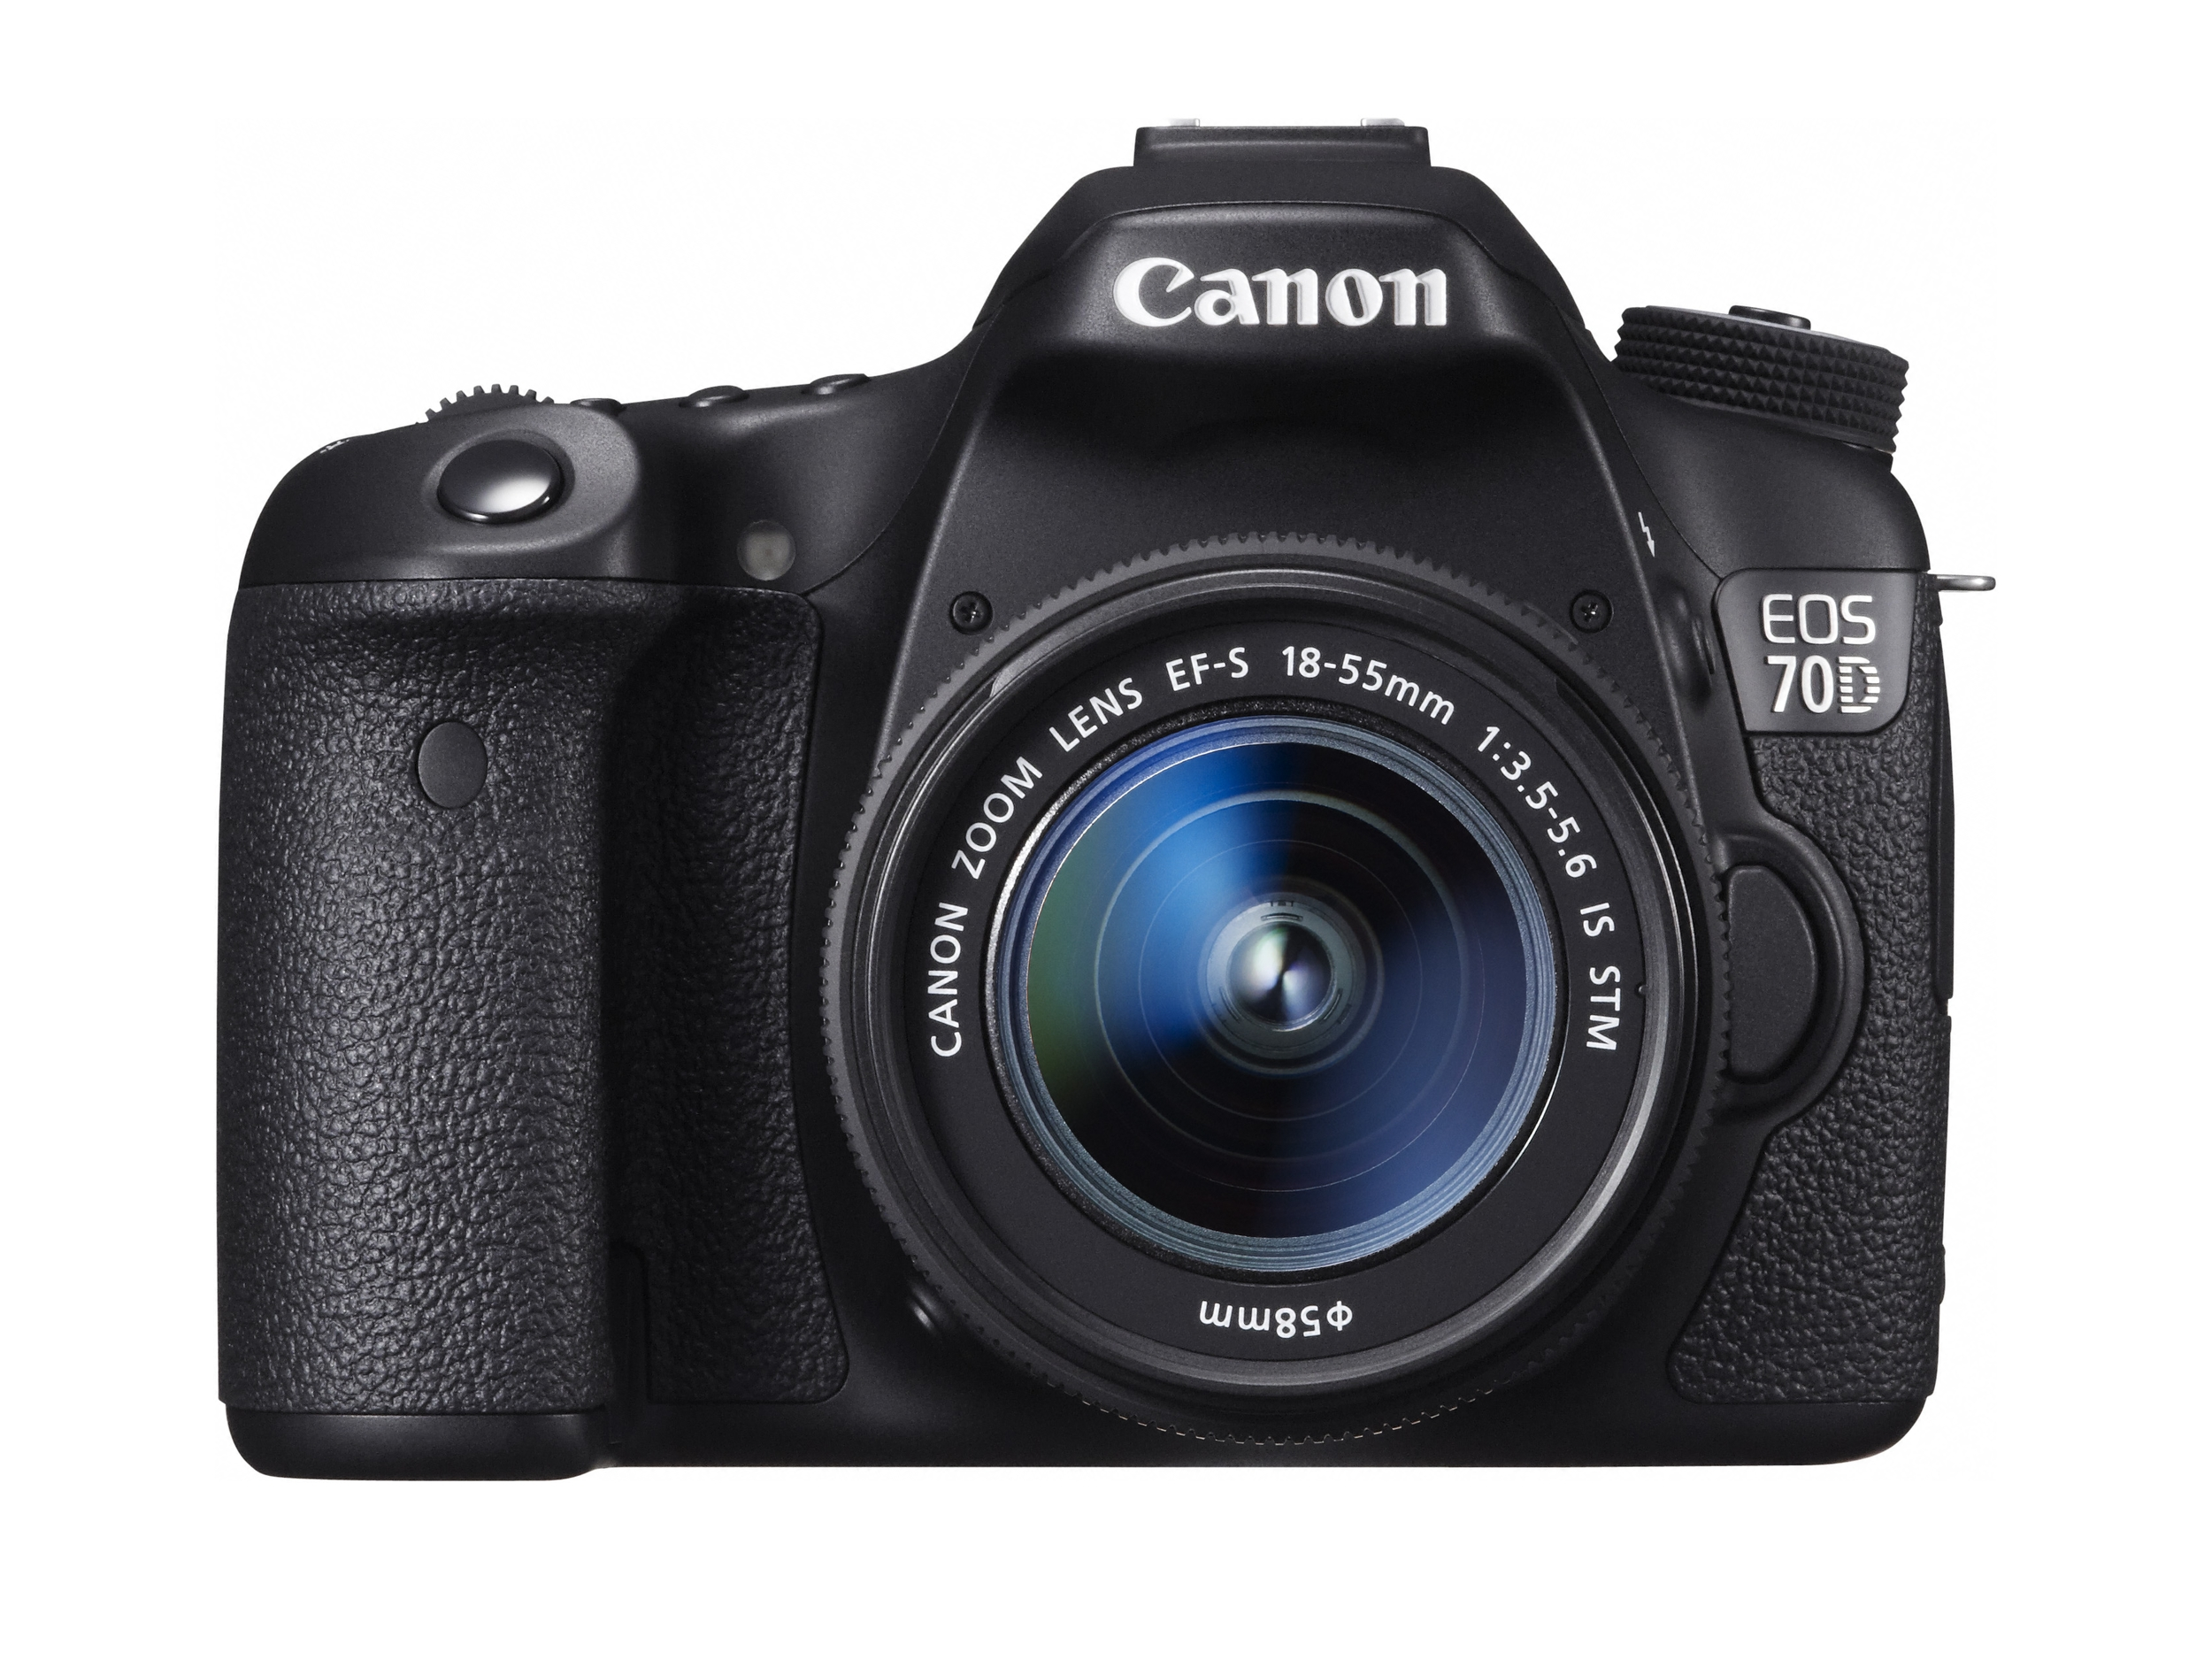 The Canon 70D